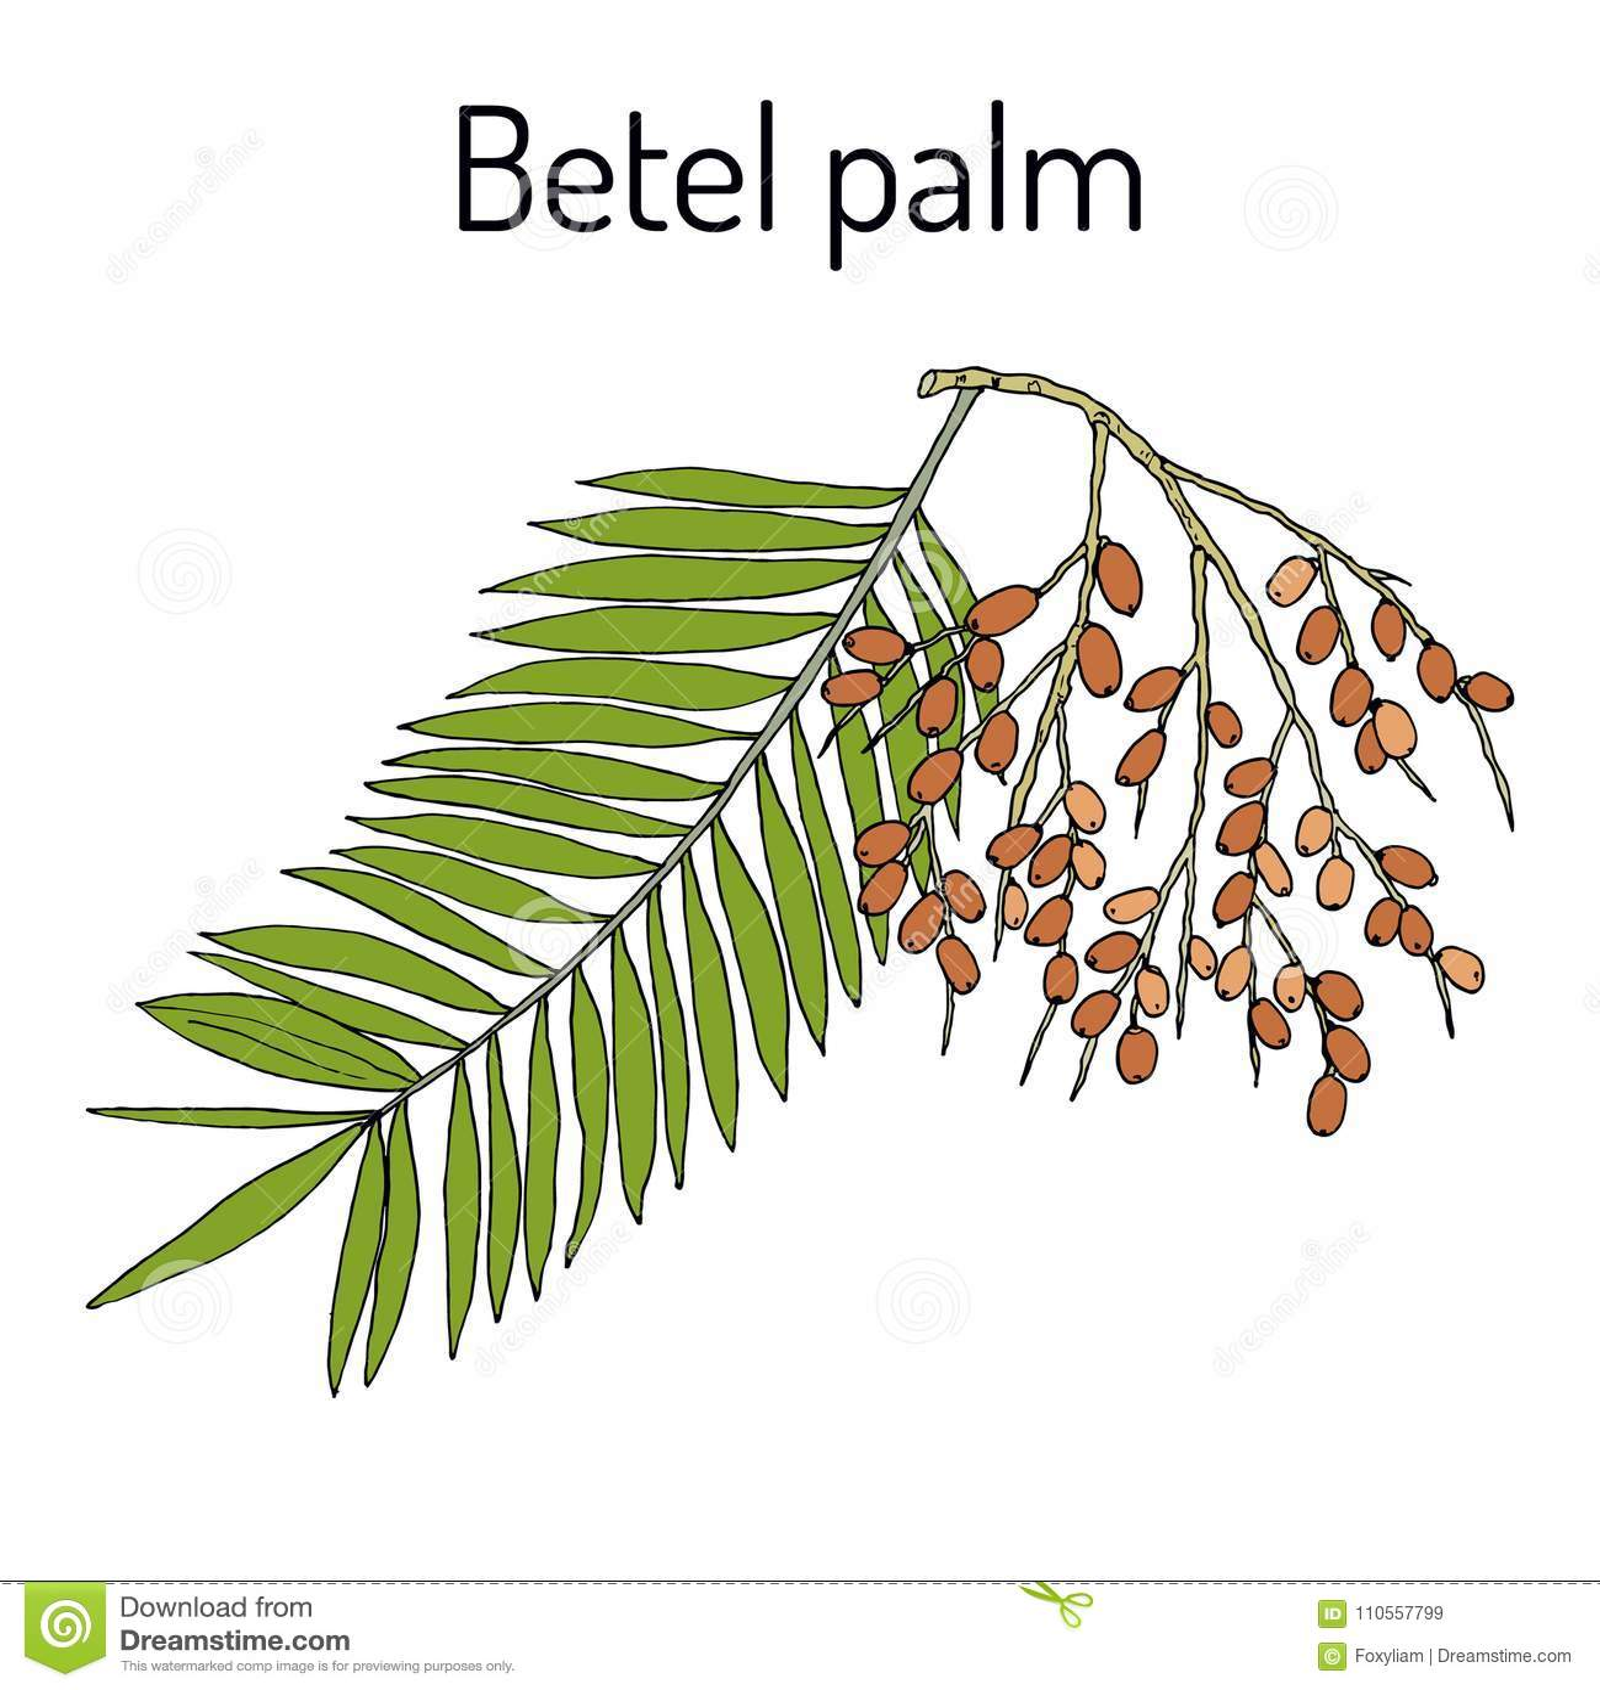 Catechu de la areca de la palma de betel, o nuez india, planta medicinal